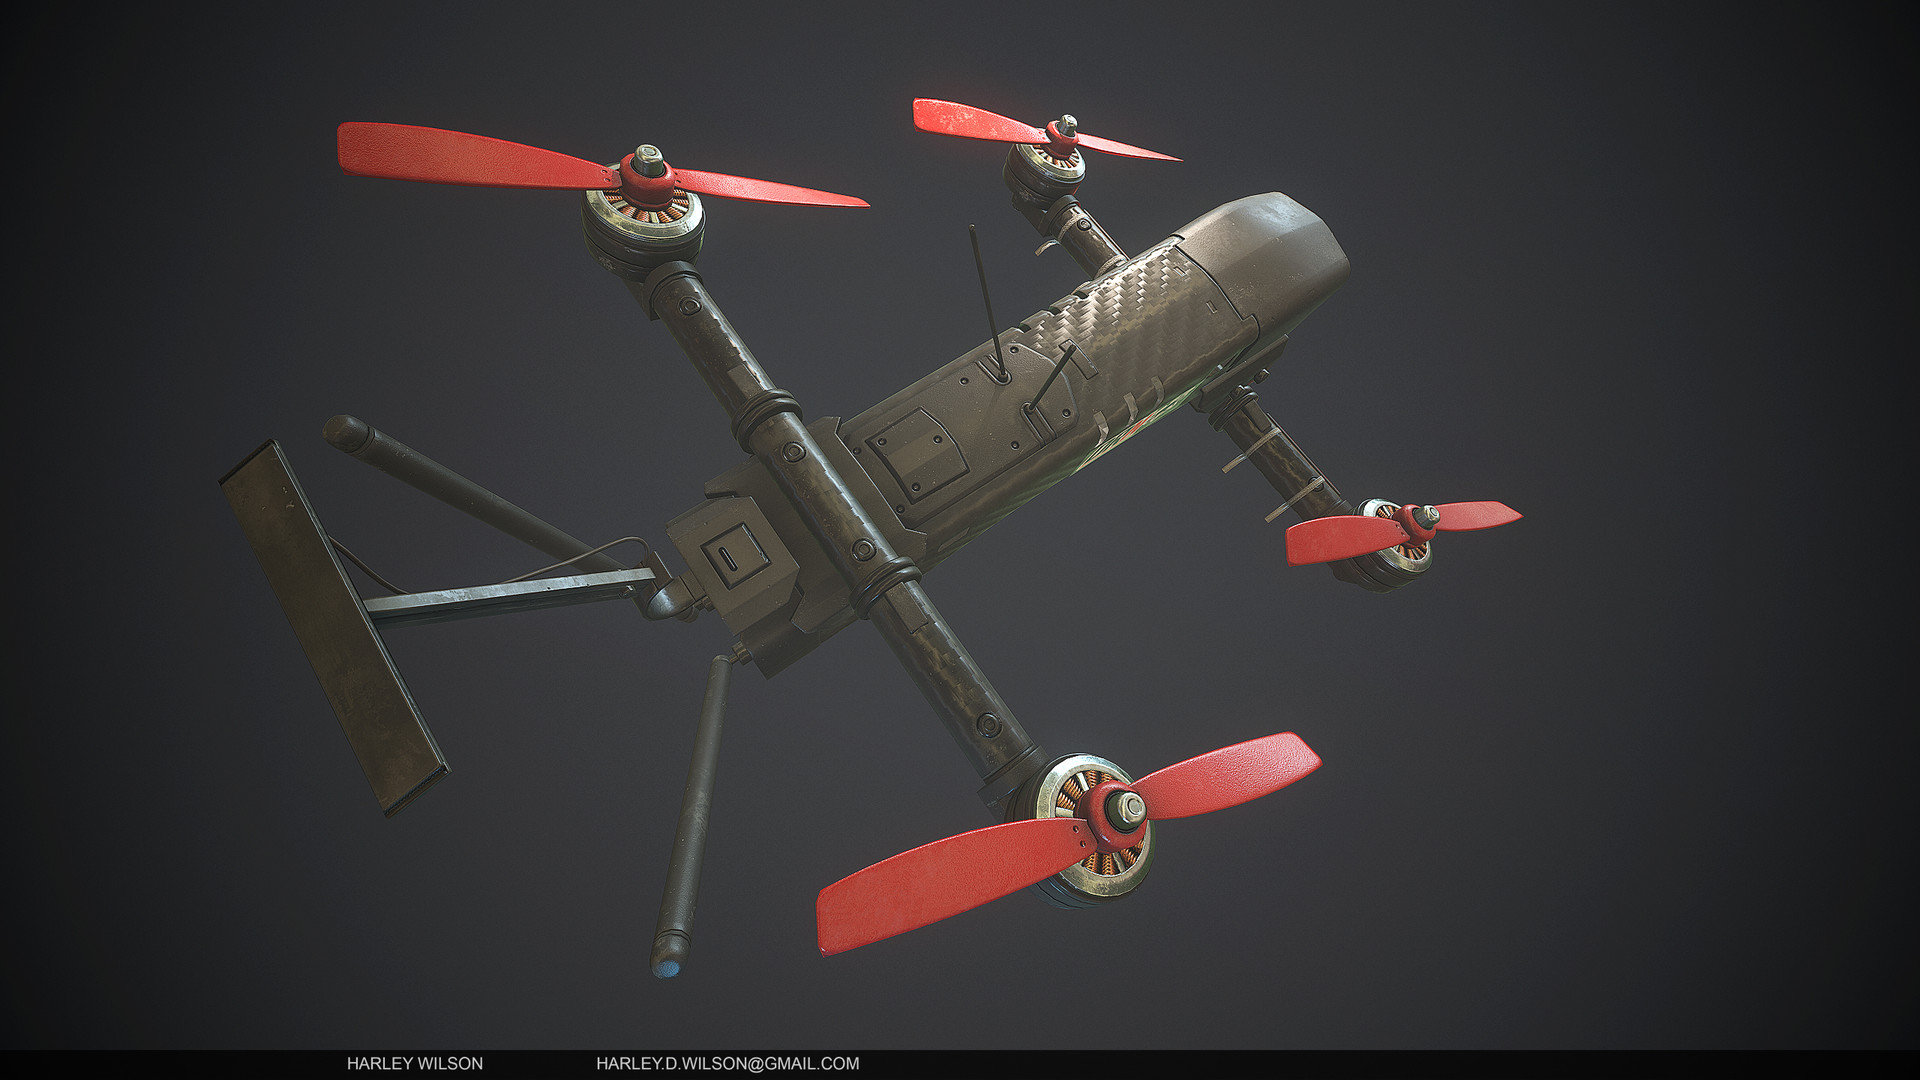 Harley wilson as drone d